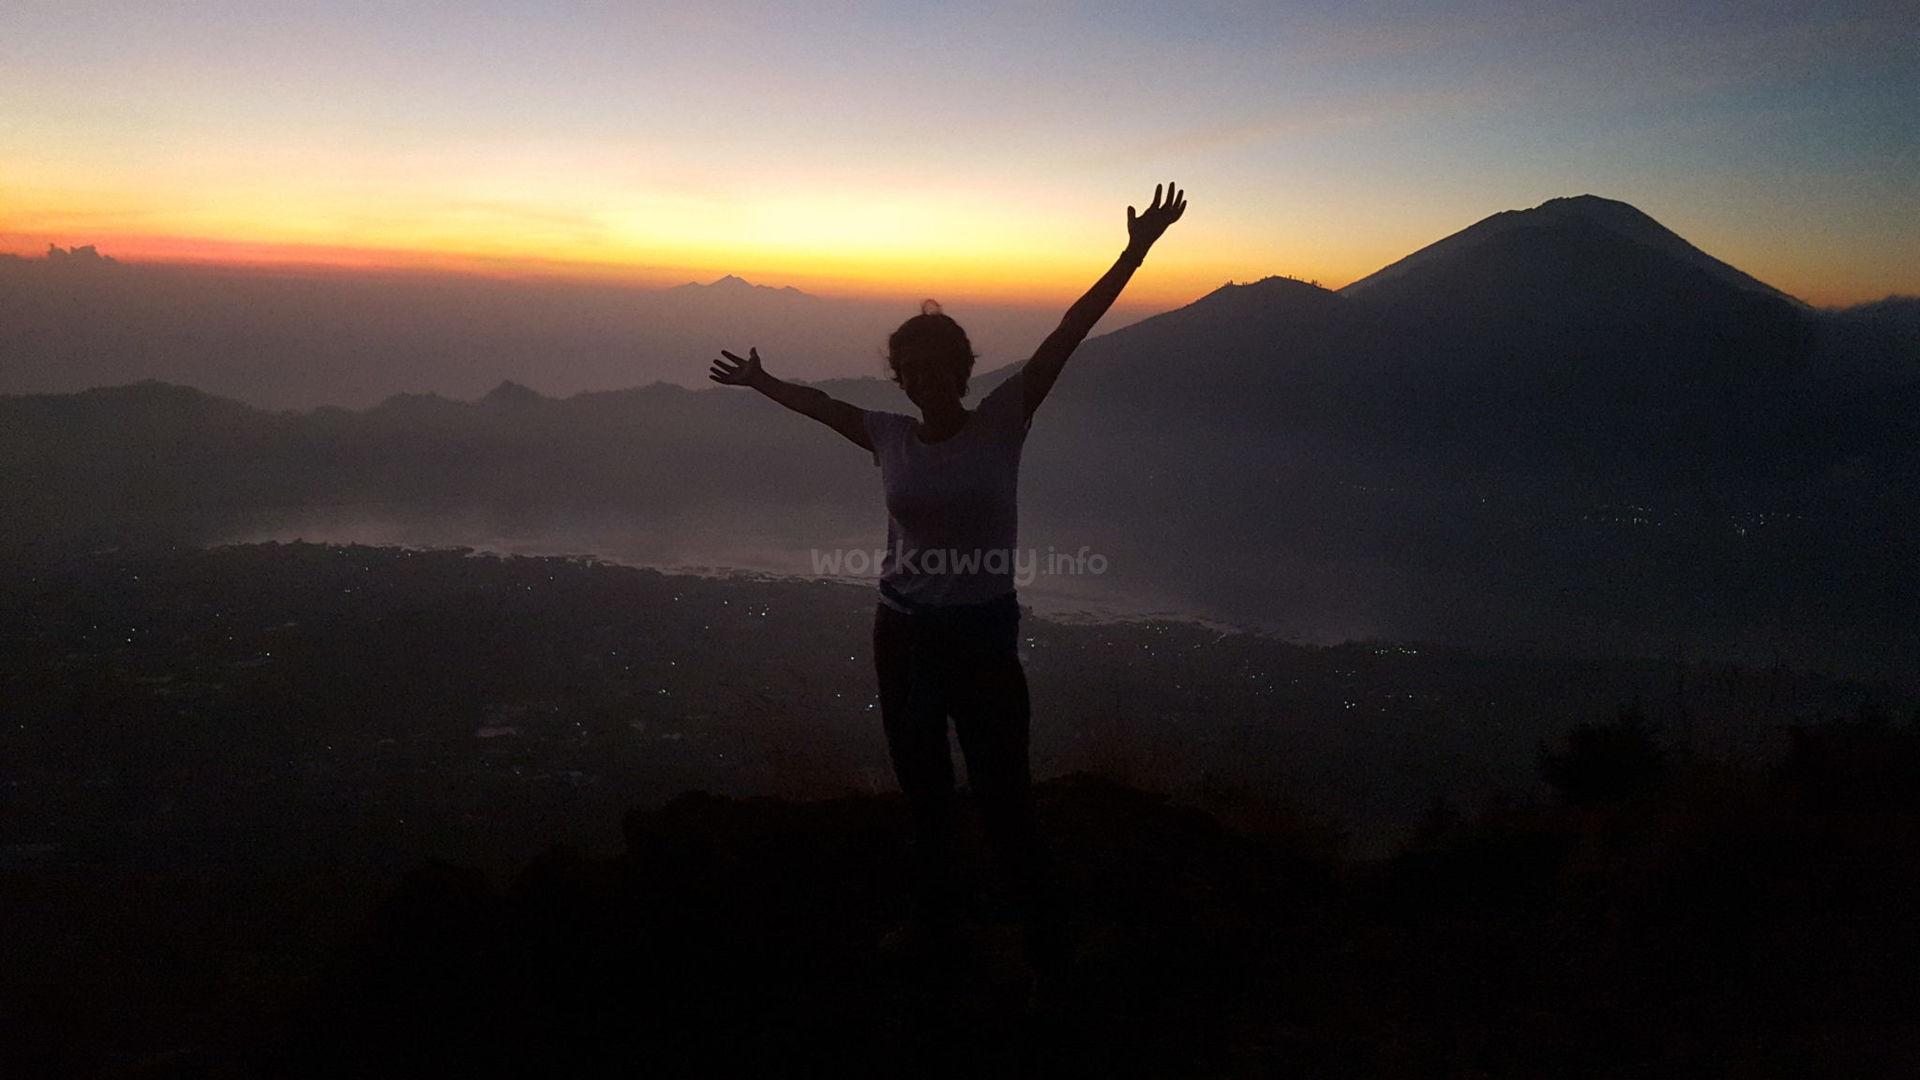 workawayer hiking sunrise background